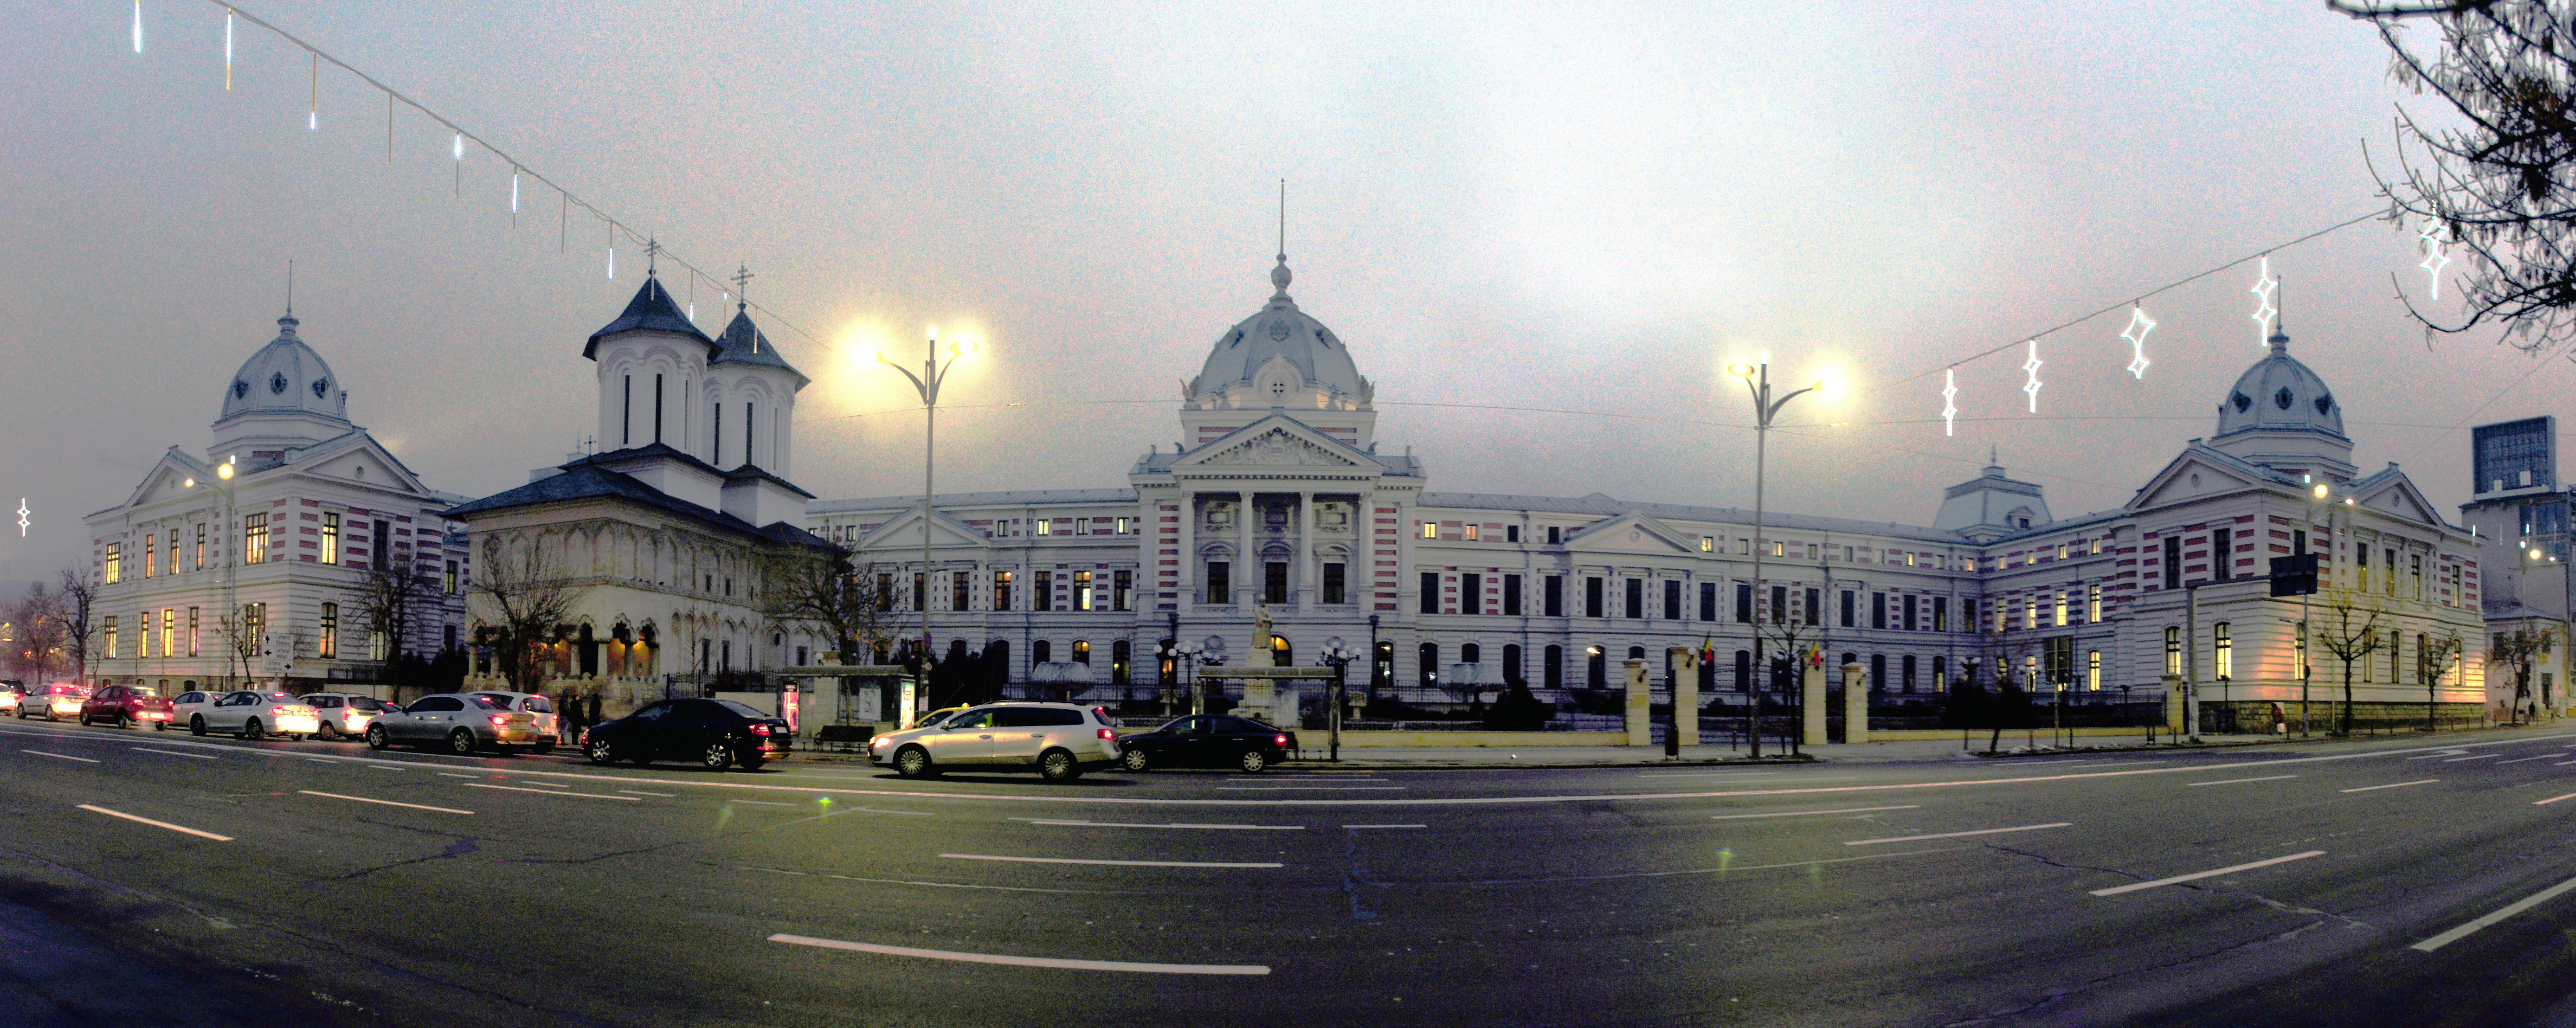 Depiction of Bucarest